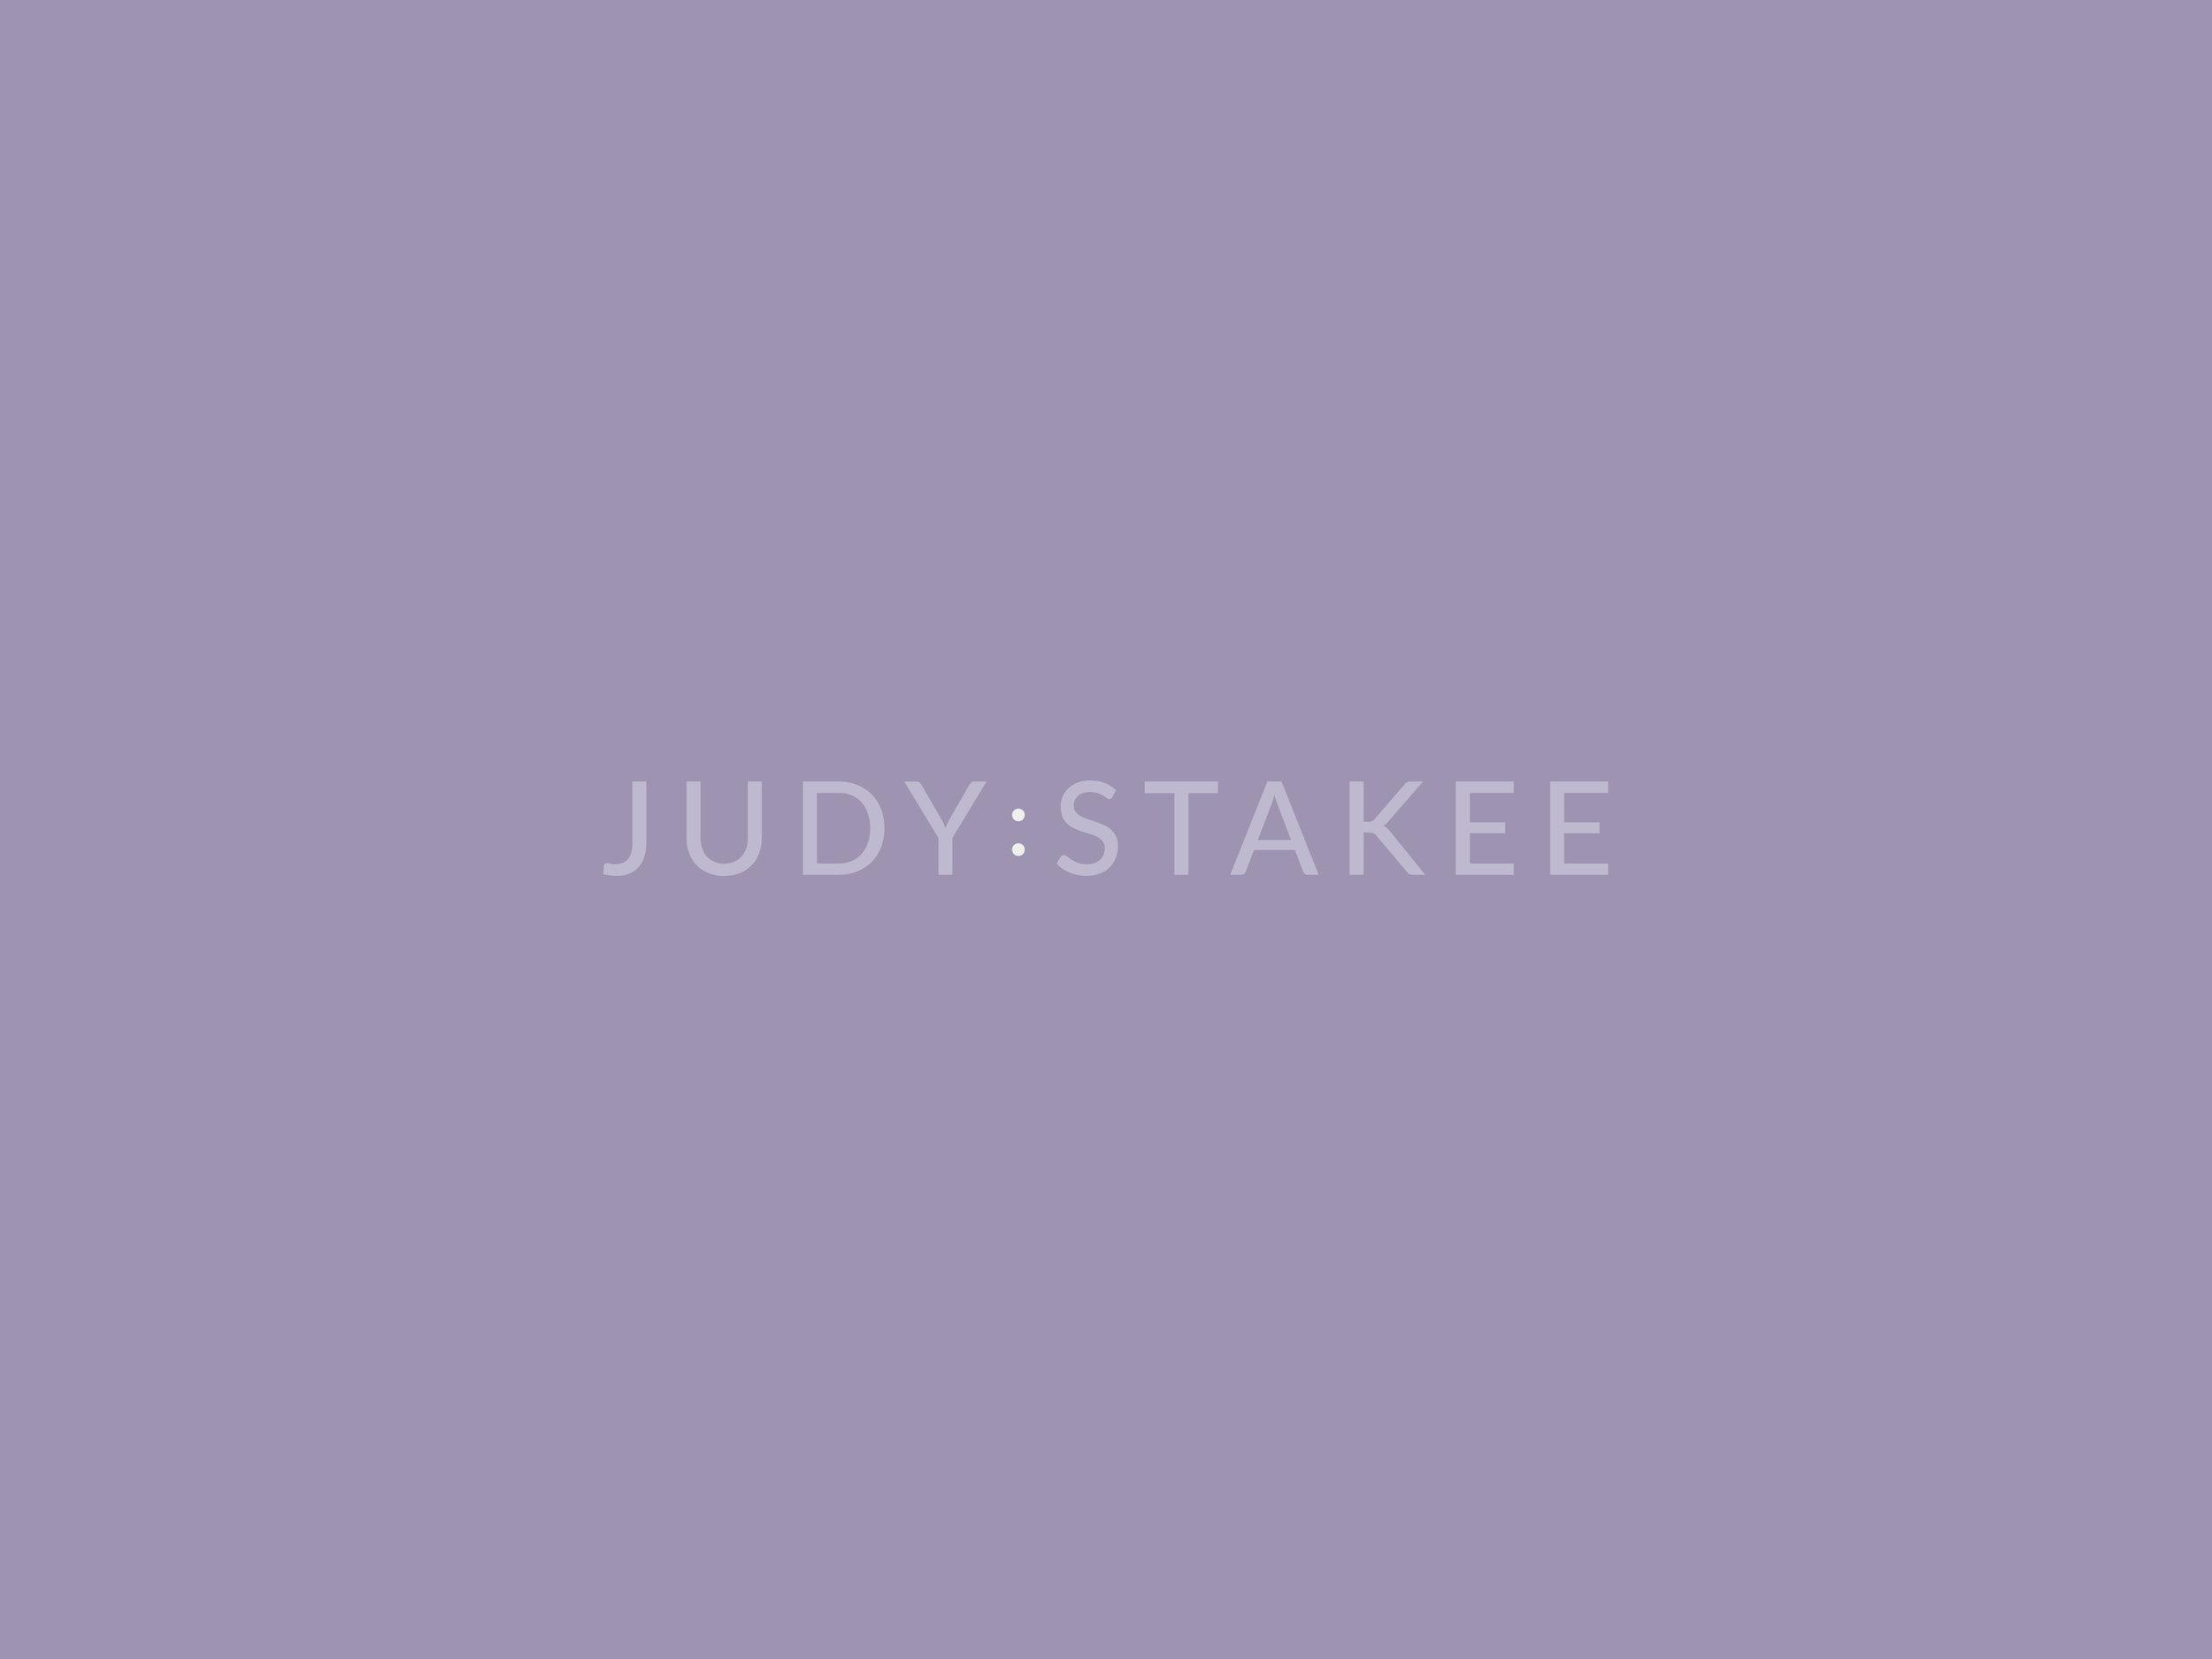 judy-stakee-brand-identity-03b.jpg